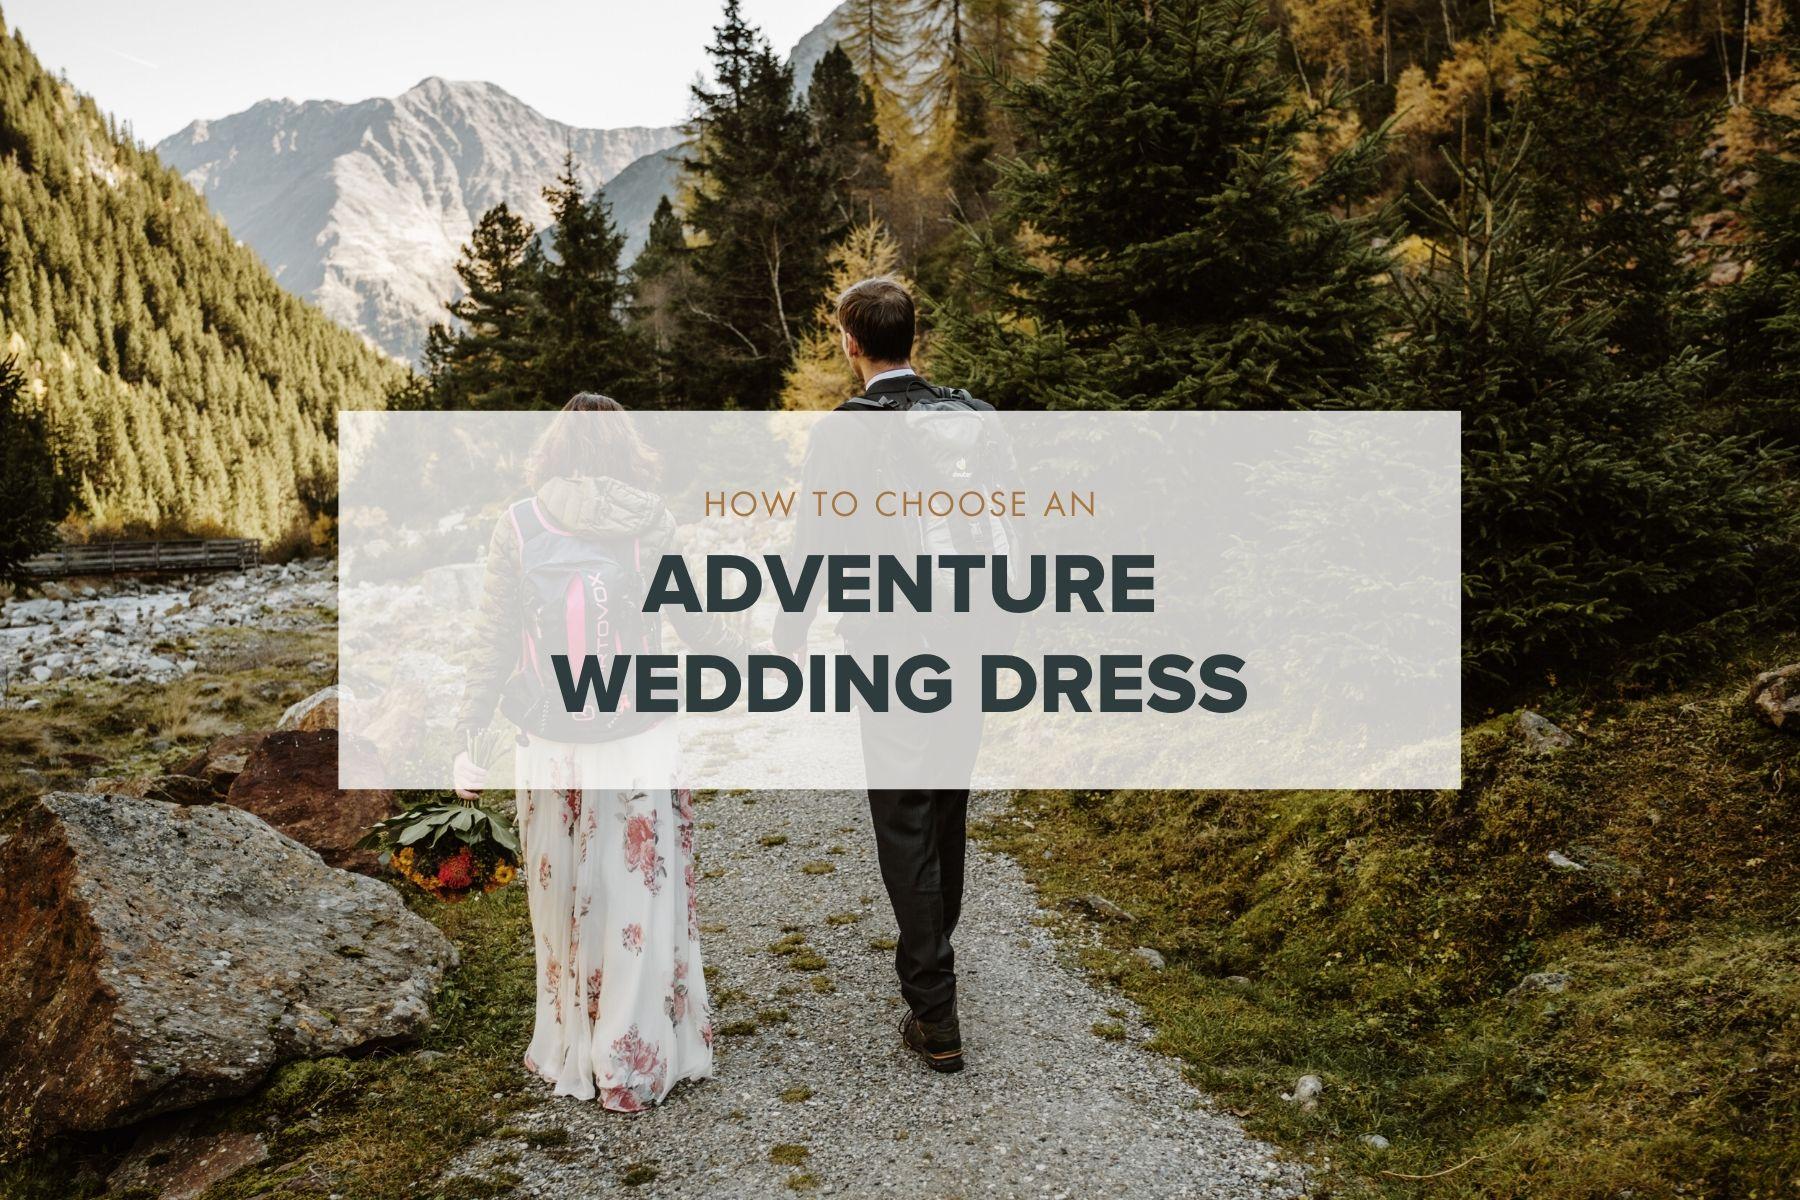 how to choose an adventure wedding dress